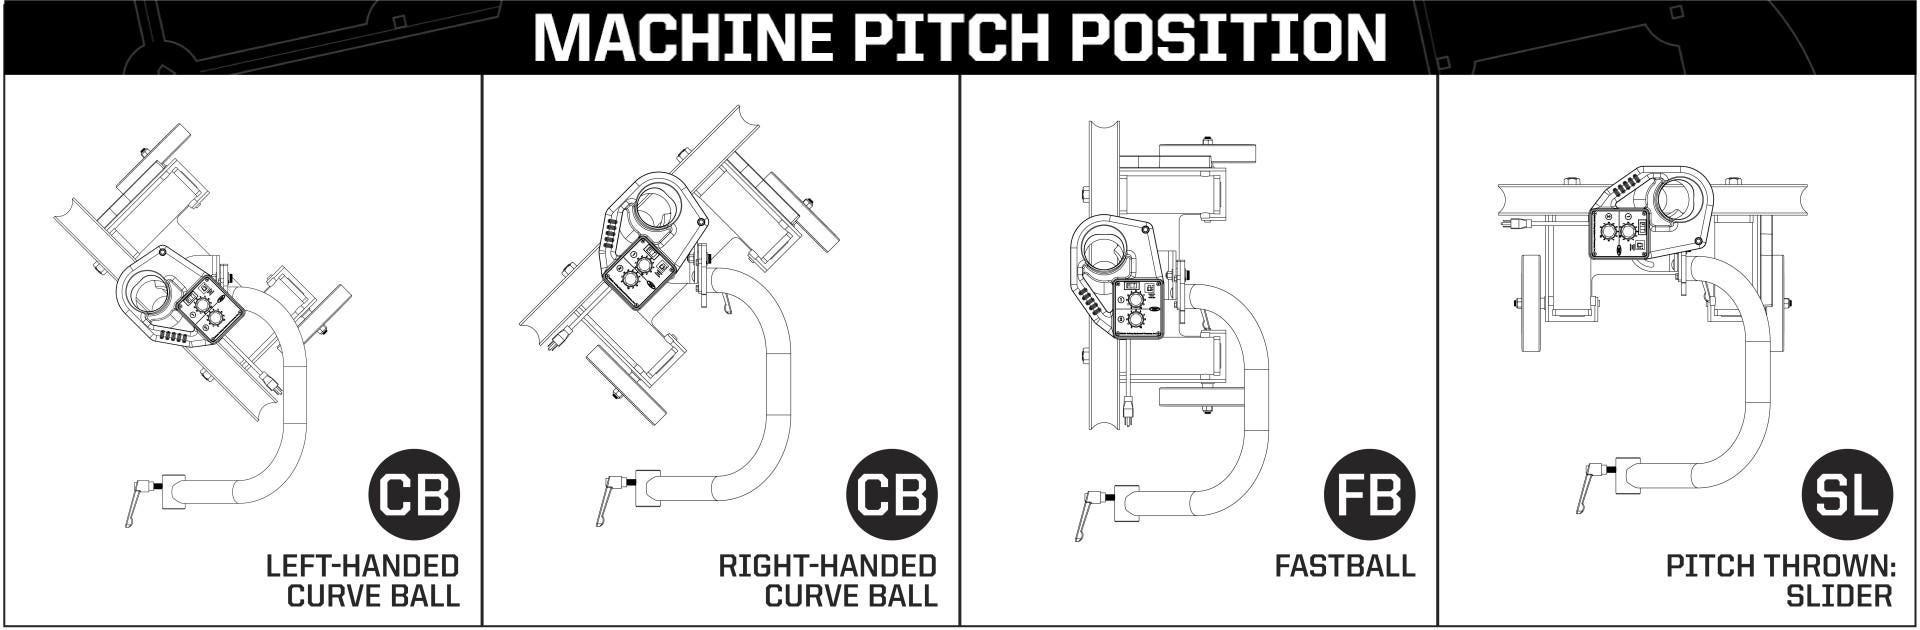 ATEC M2 Pitch Position